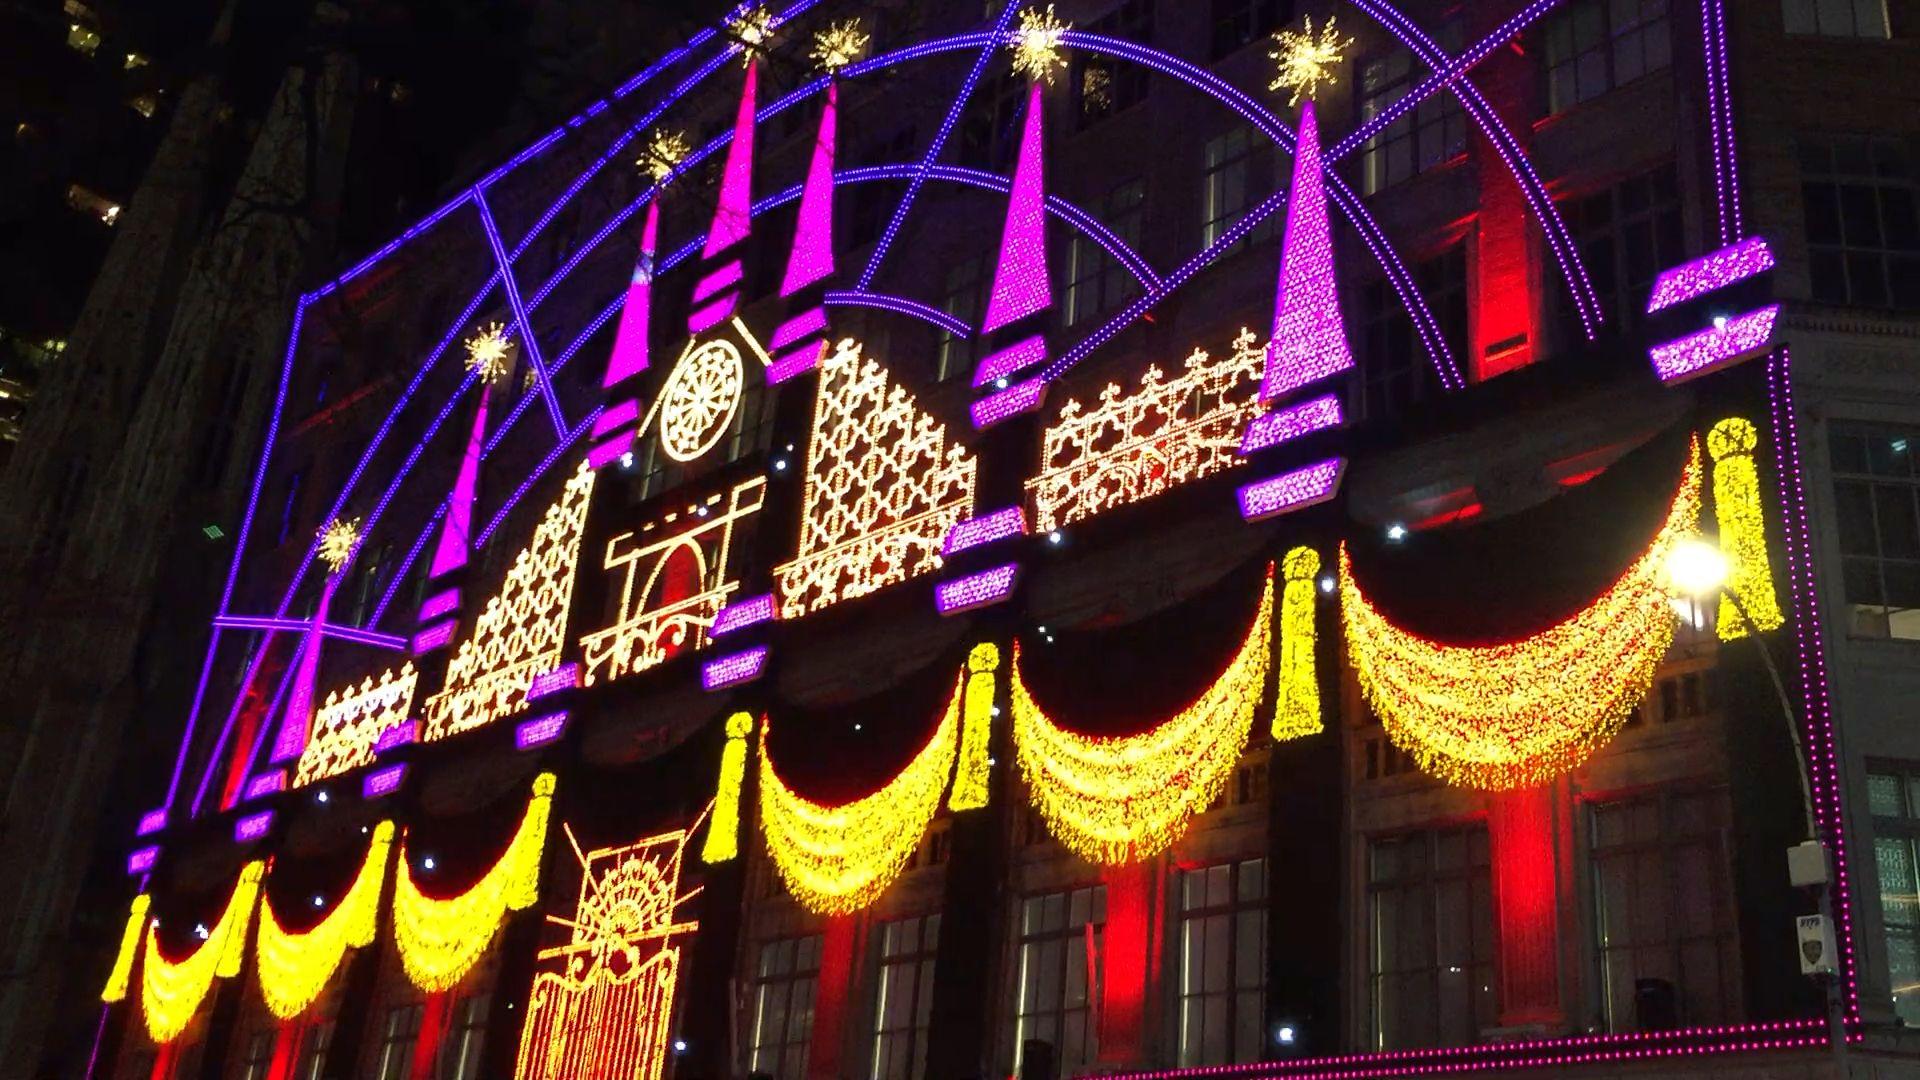 #Christmas #newyorkcity #lights #blogmas #christmasinnewyork #videos #videoshow